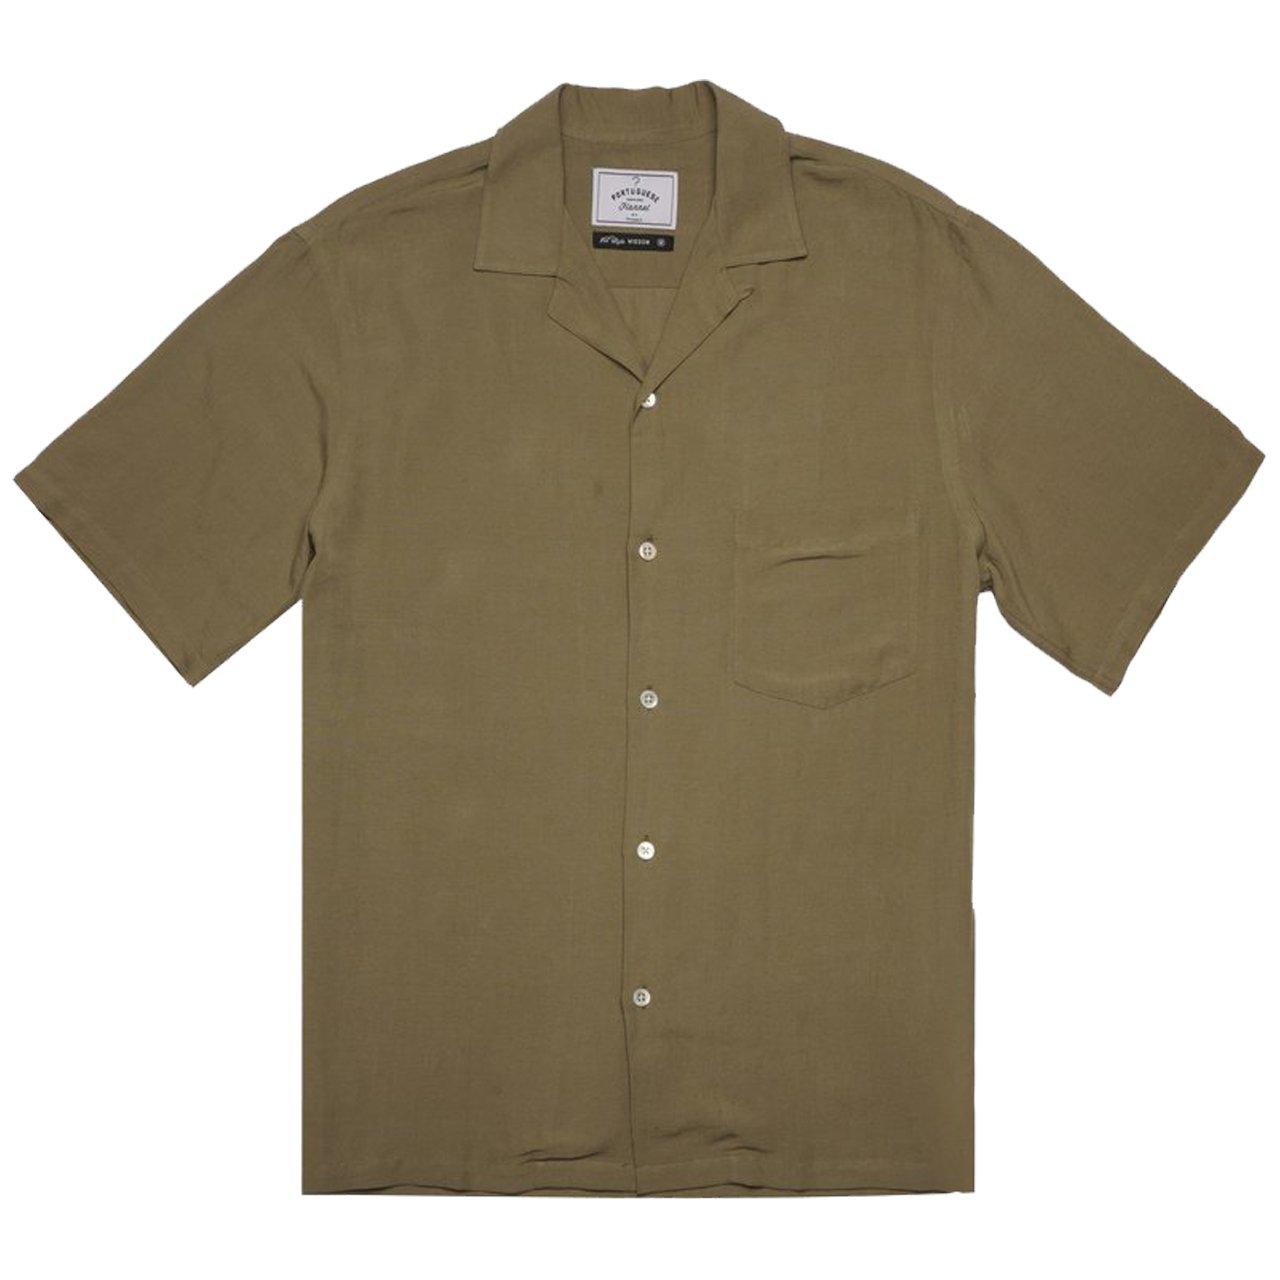 1940s Men's Shirts, Sweaters, Vests Portuguese Flannel Dogtown Shirt - Olive Green $116.00 AT vintagedancer.com